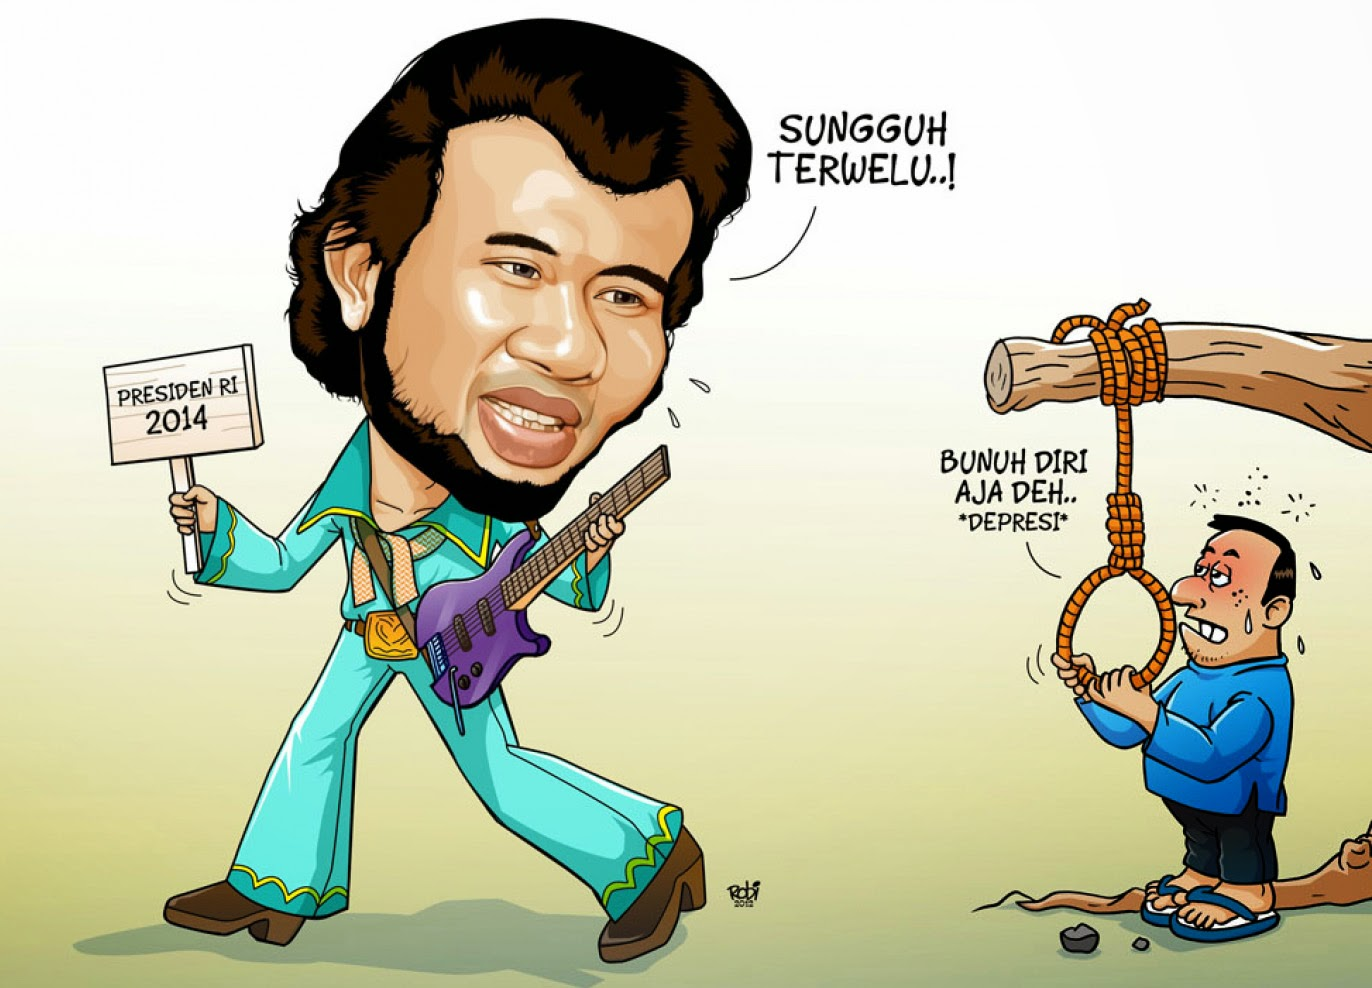 KUMPULAN GAMBAR KARIKATUR LUCU Kartun Karikatur Politik Orang